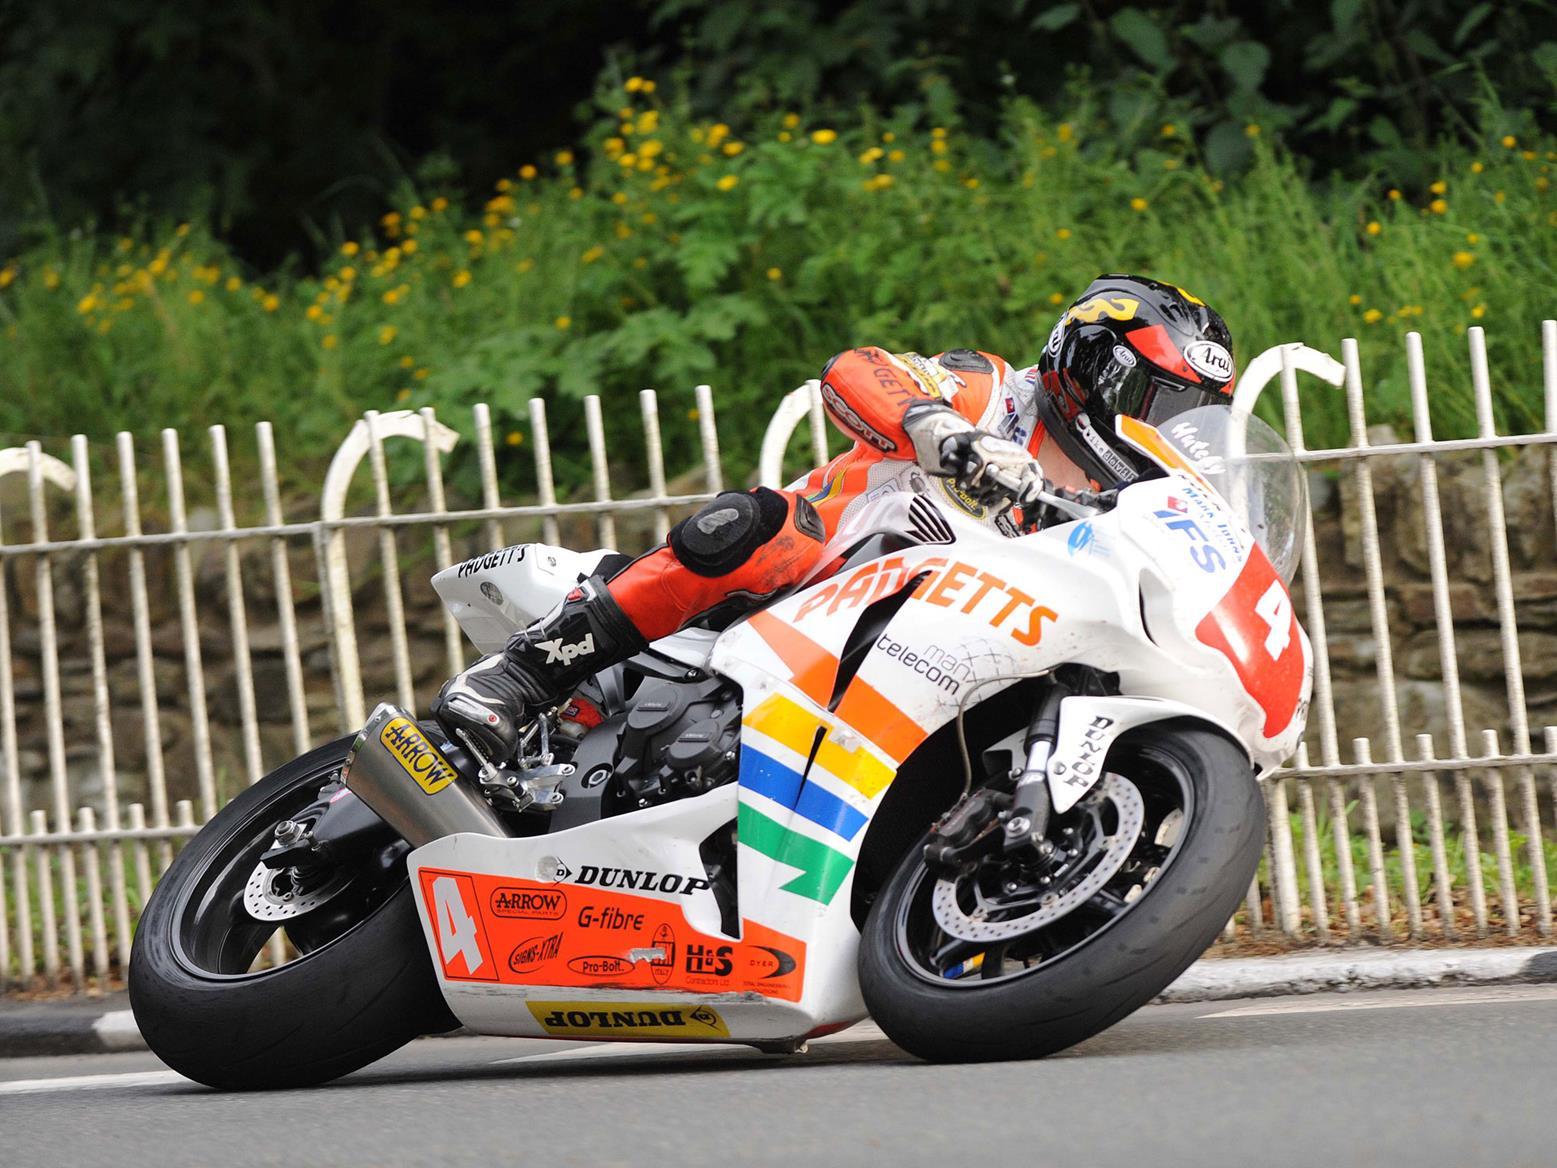 Hutchy 2009 Superstock TT win